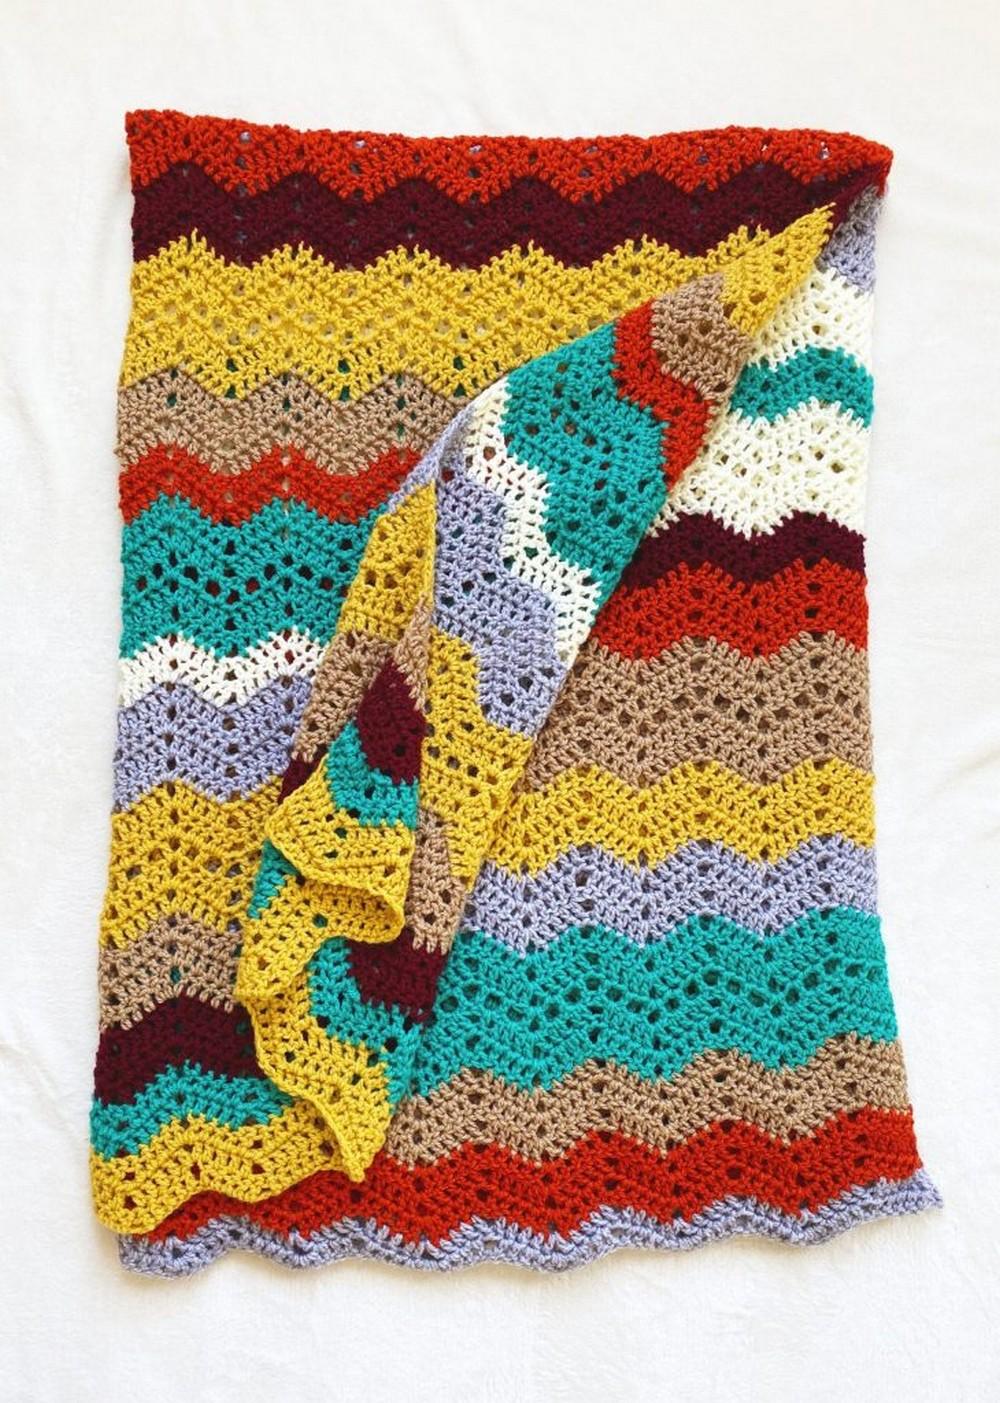 Multi-coloured Crochet Chevron Throw Blanket Pattern